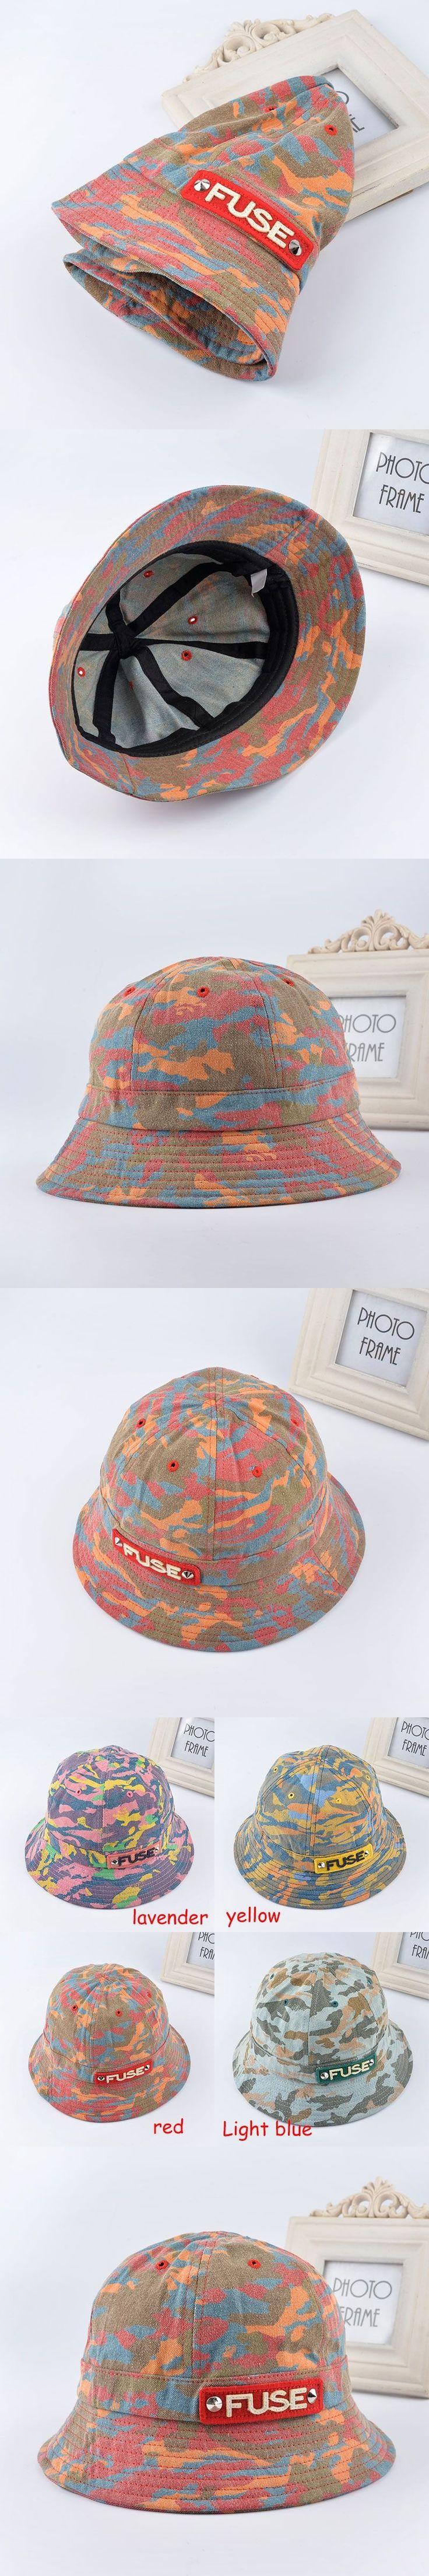 2016 new man camouflage military Fishing cap Bob Hunting Bucket Hats for men women gorras planas hip hop hat #MilitaryHatsForWomen